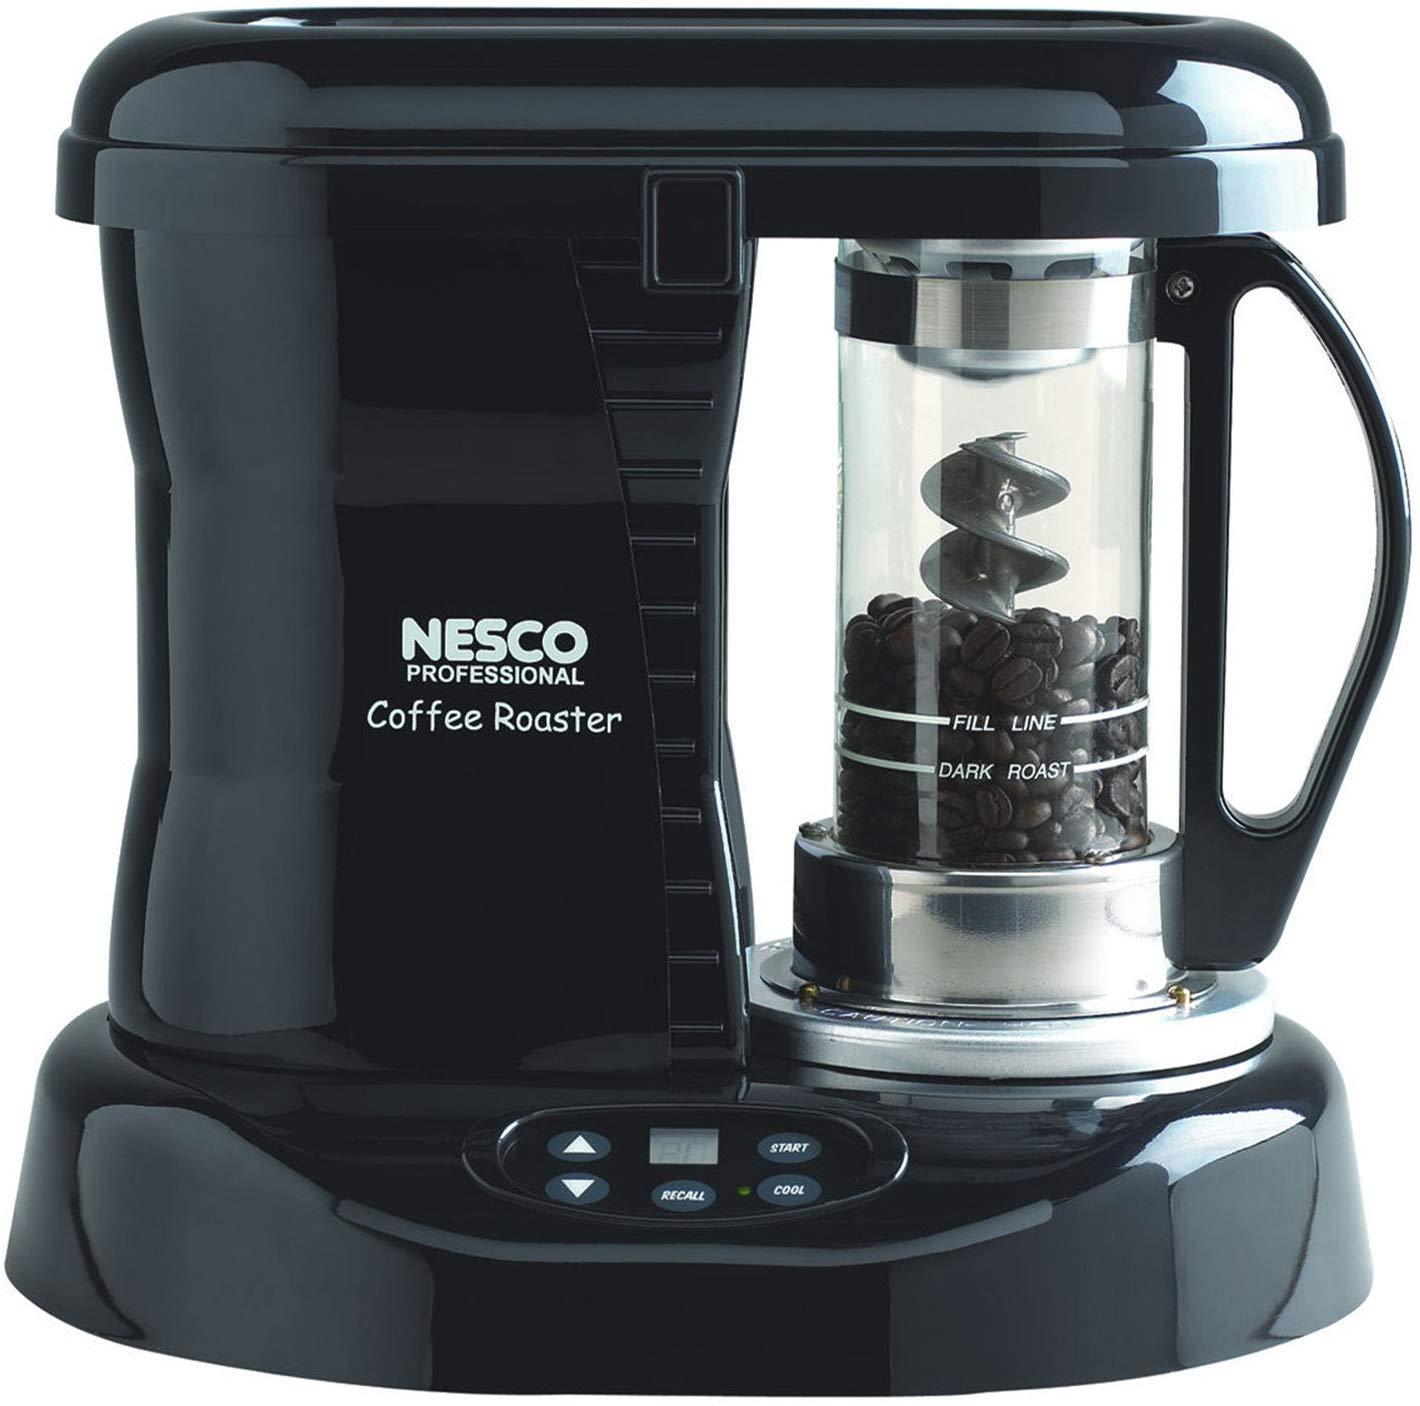 Nesco CR1010 Professional